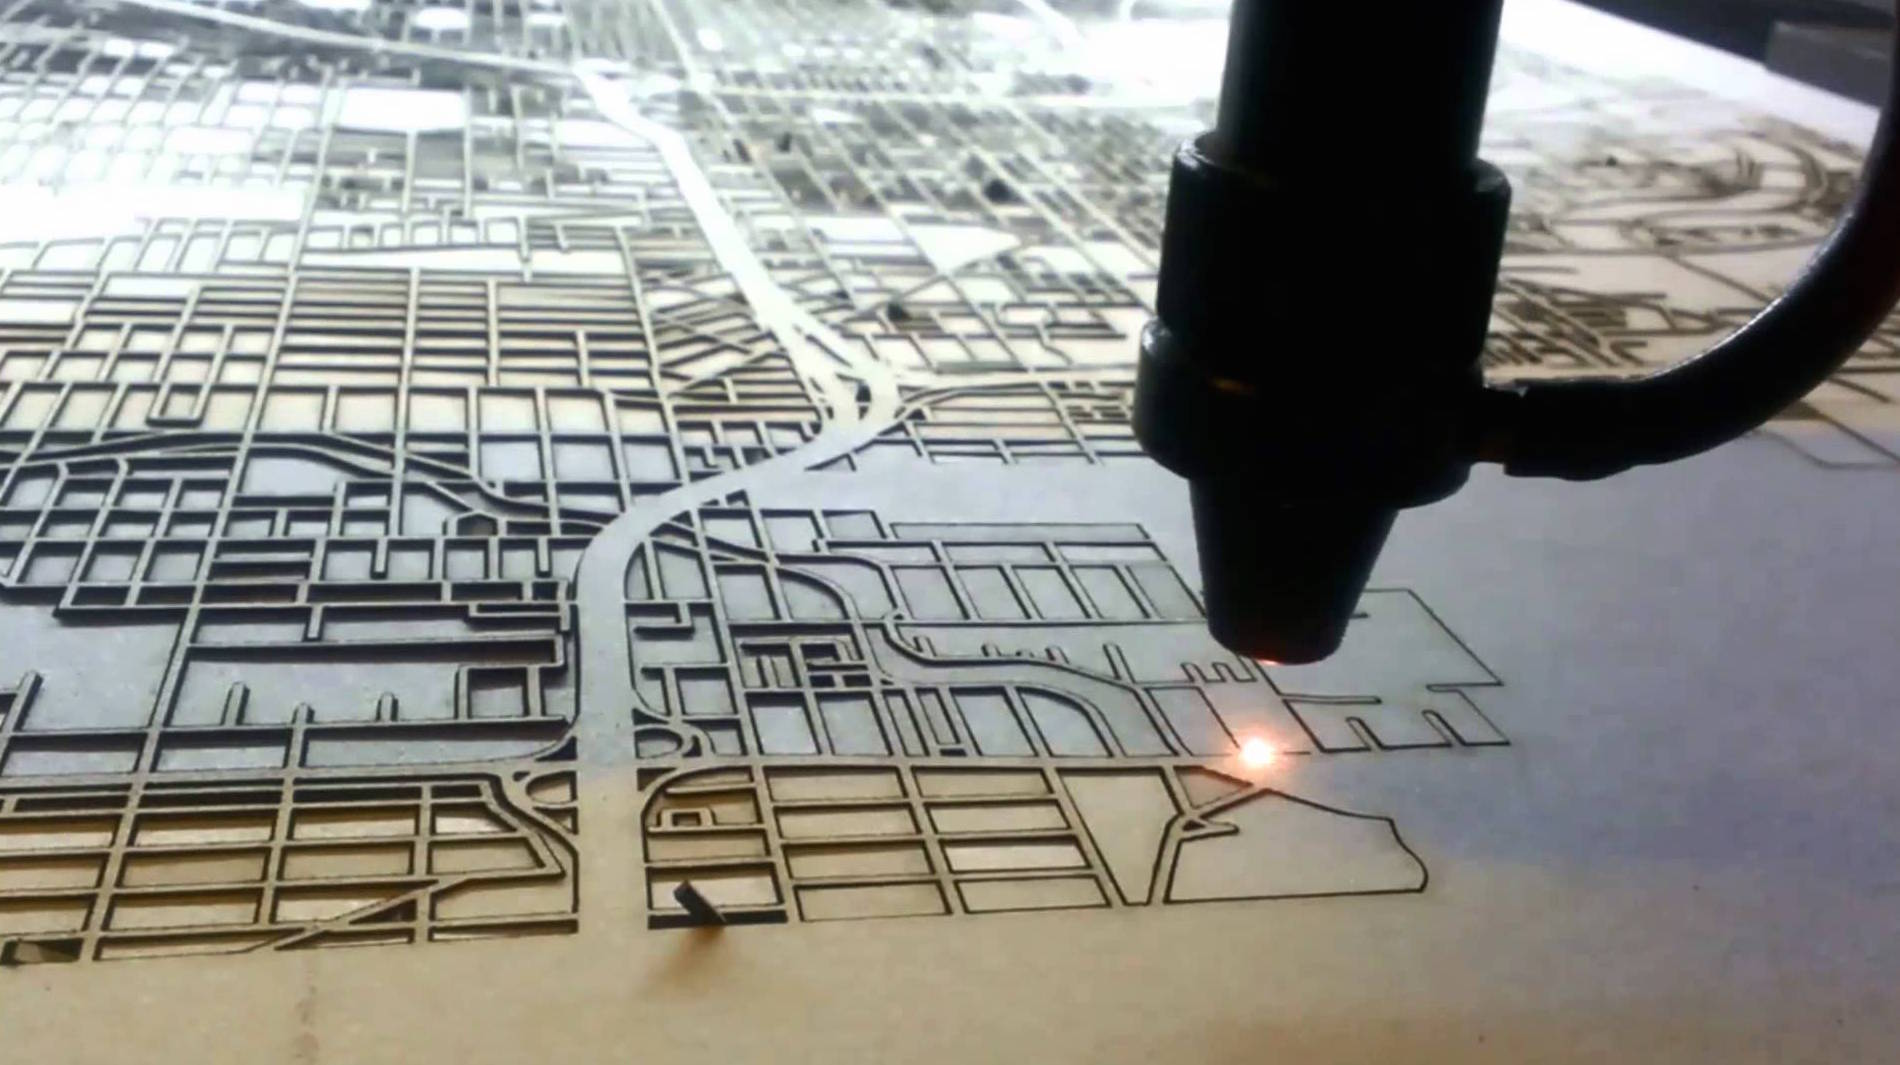 LaserStreetMap